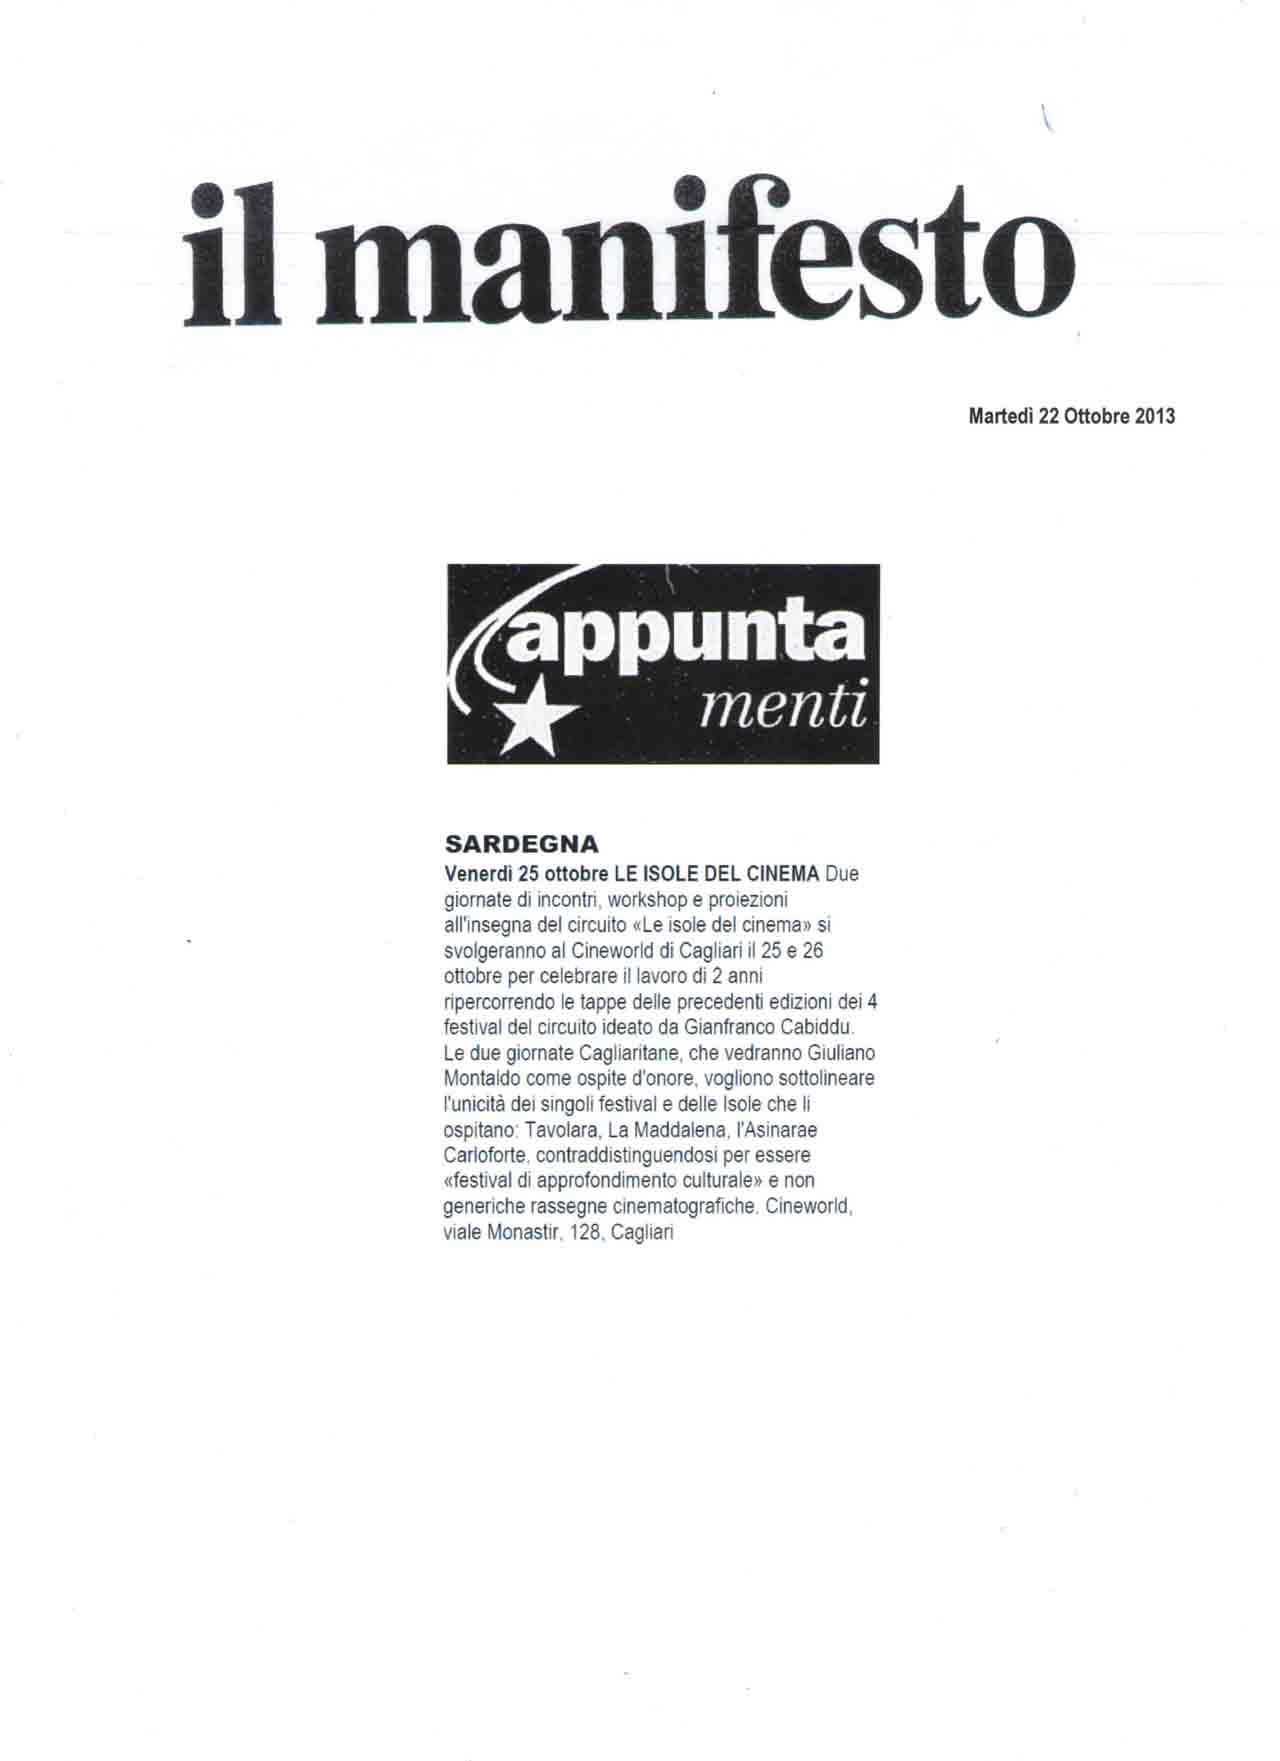 026 Il Manifesto